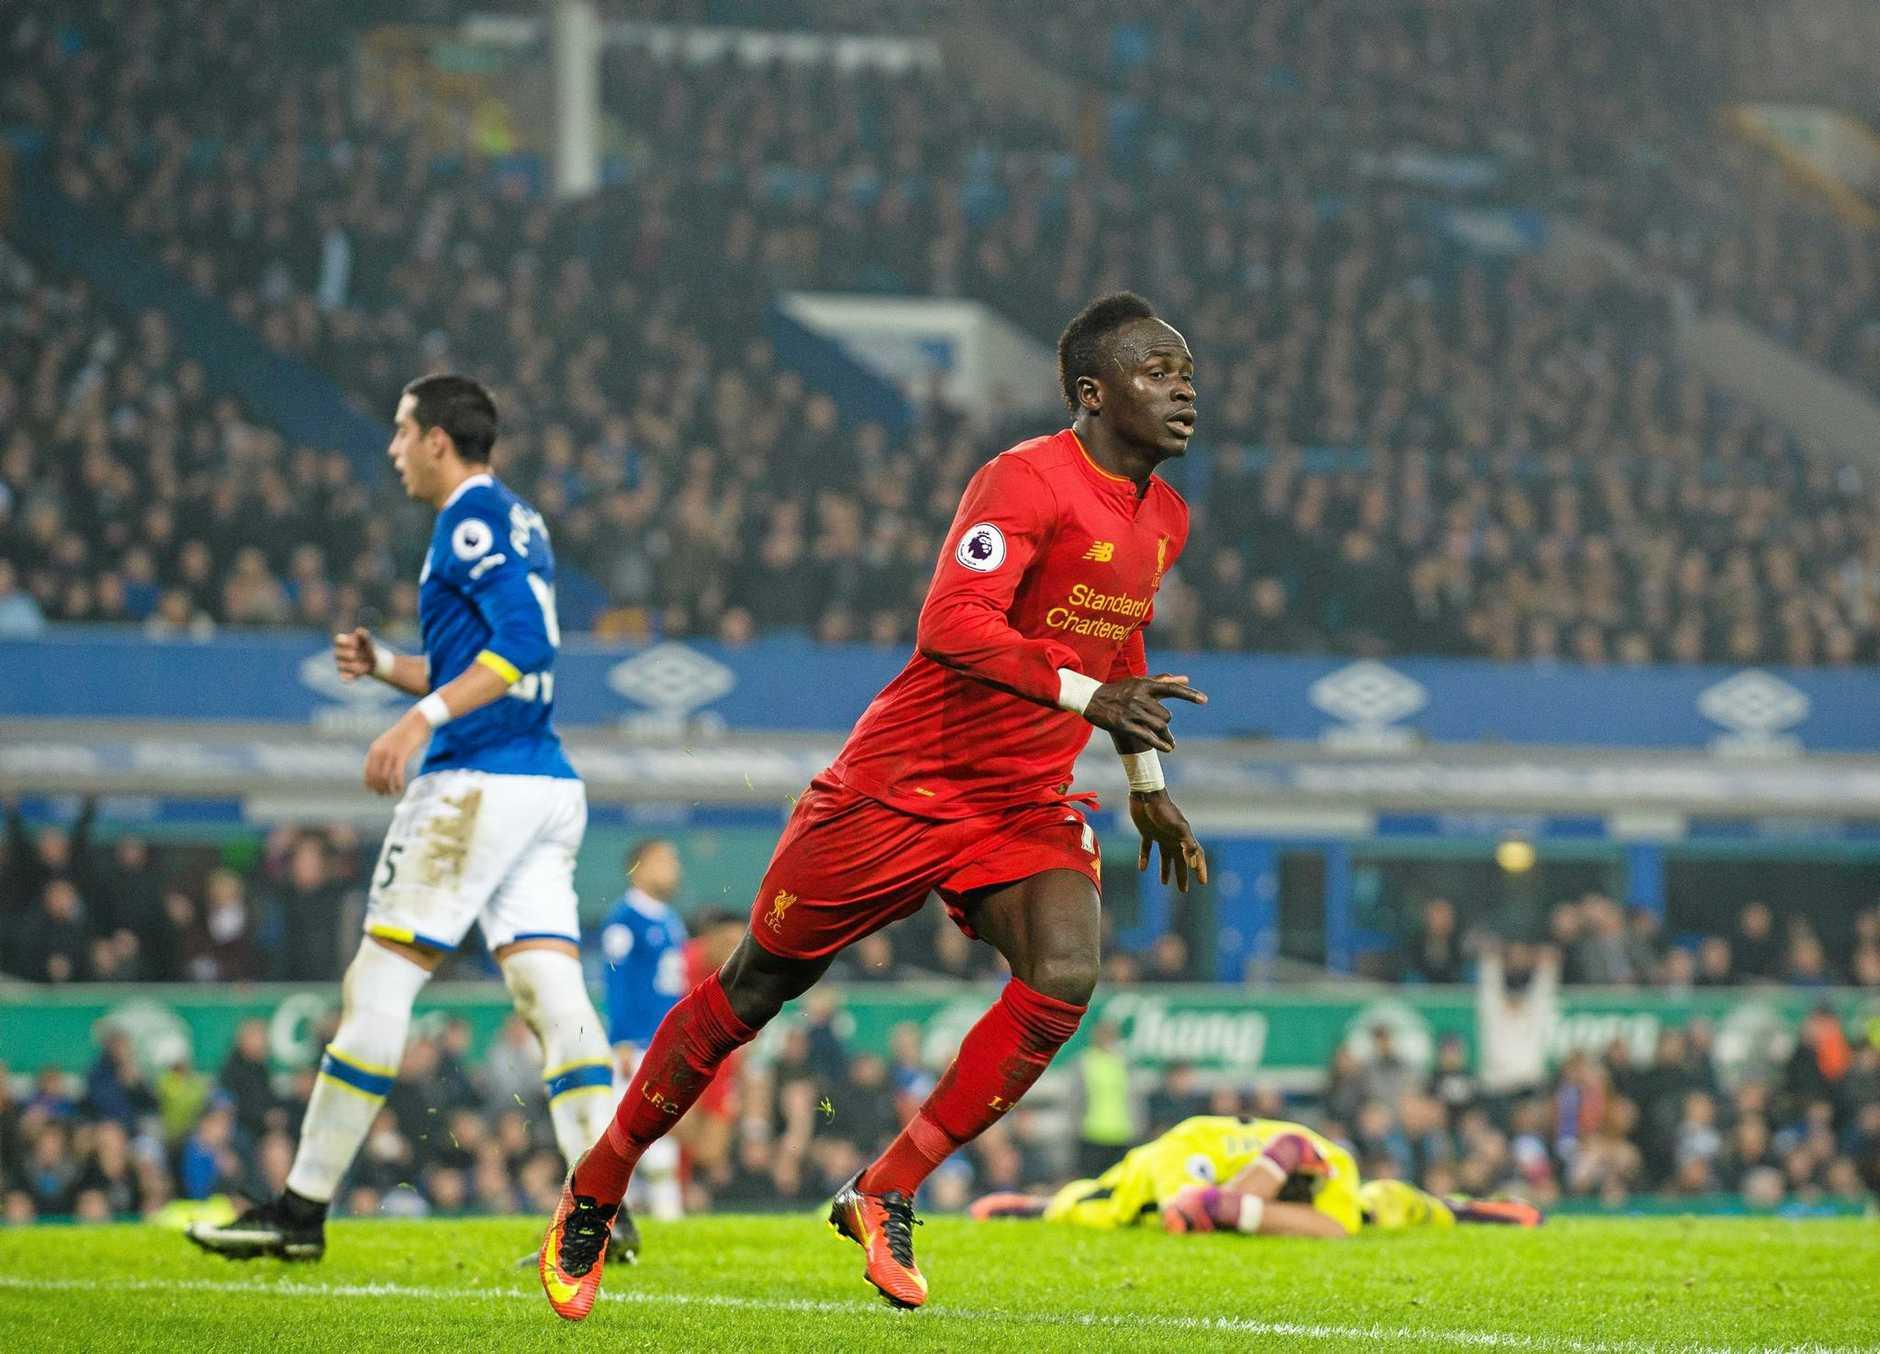 Liverpool's Sadio Mane celebrates scoring the winner against Everton at Goodison Park.